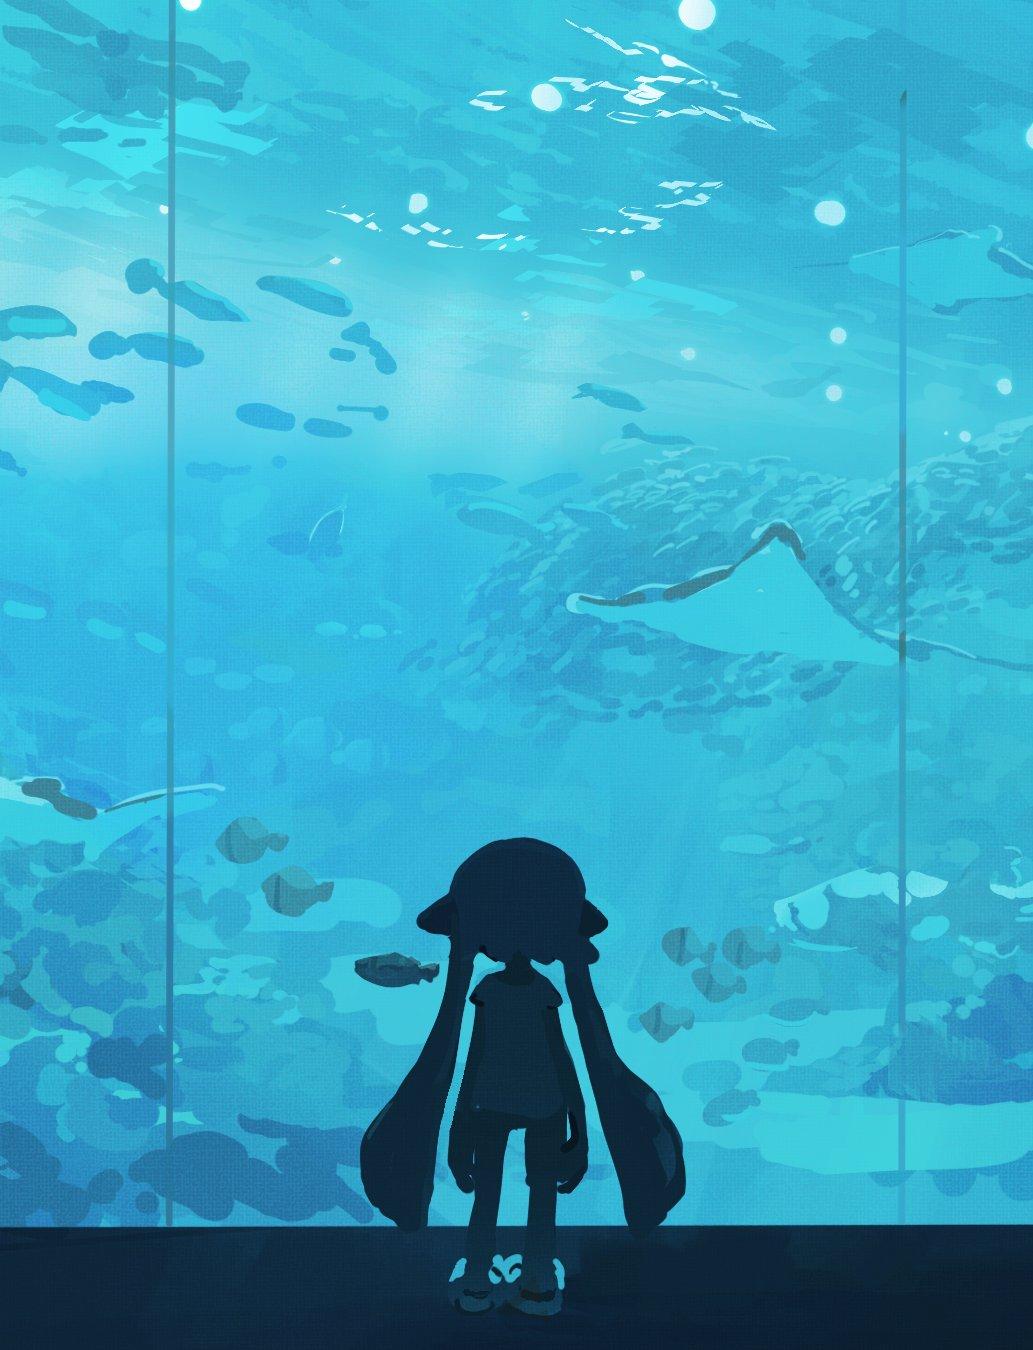 1girl aqua_theme aquarium aspara blurry bokeh depth_of_field fish from_behind highres indoors inkling long_hair manta_ray pointy_ears shirt shoes shorts solo splatoon_(series) splatoon_1 standing tentacle_hair very_long_hair water